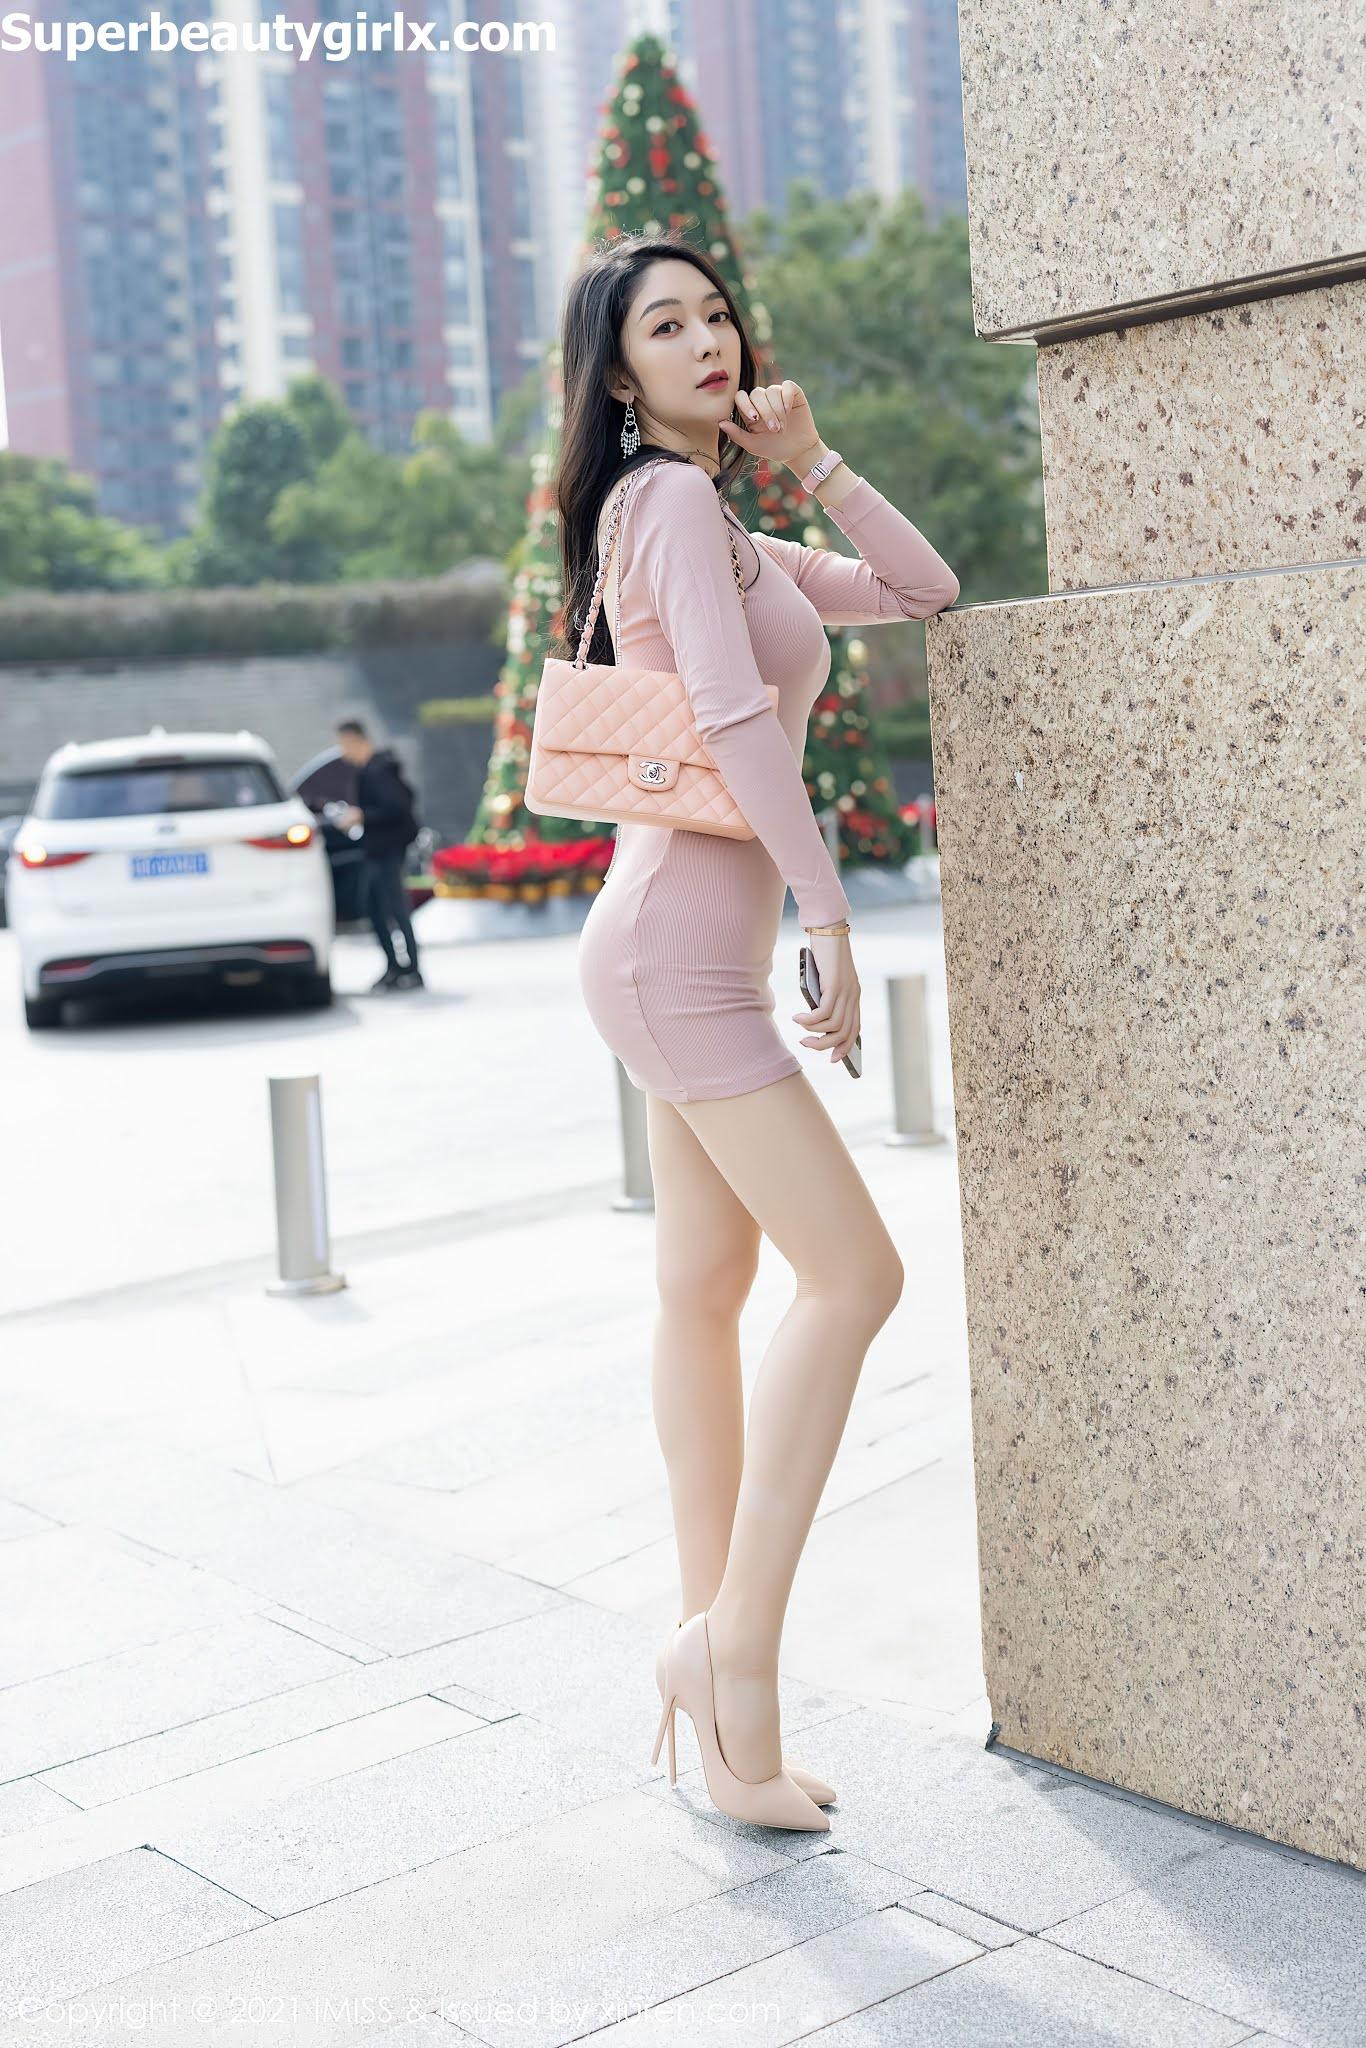 IMISS-Vol.564-Xiao-Reba-Angela-Superbeautygirlx.com